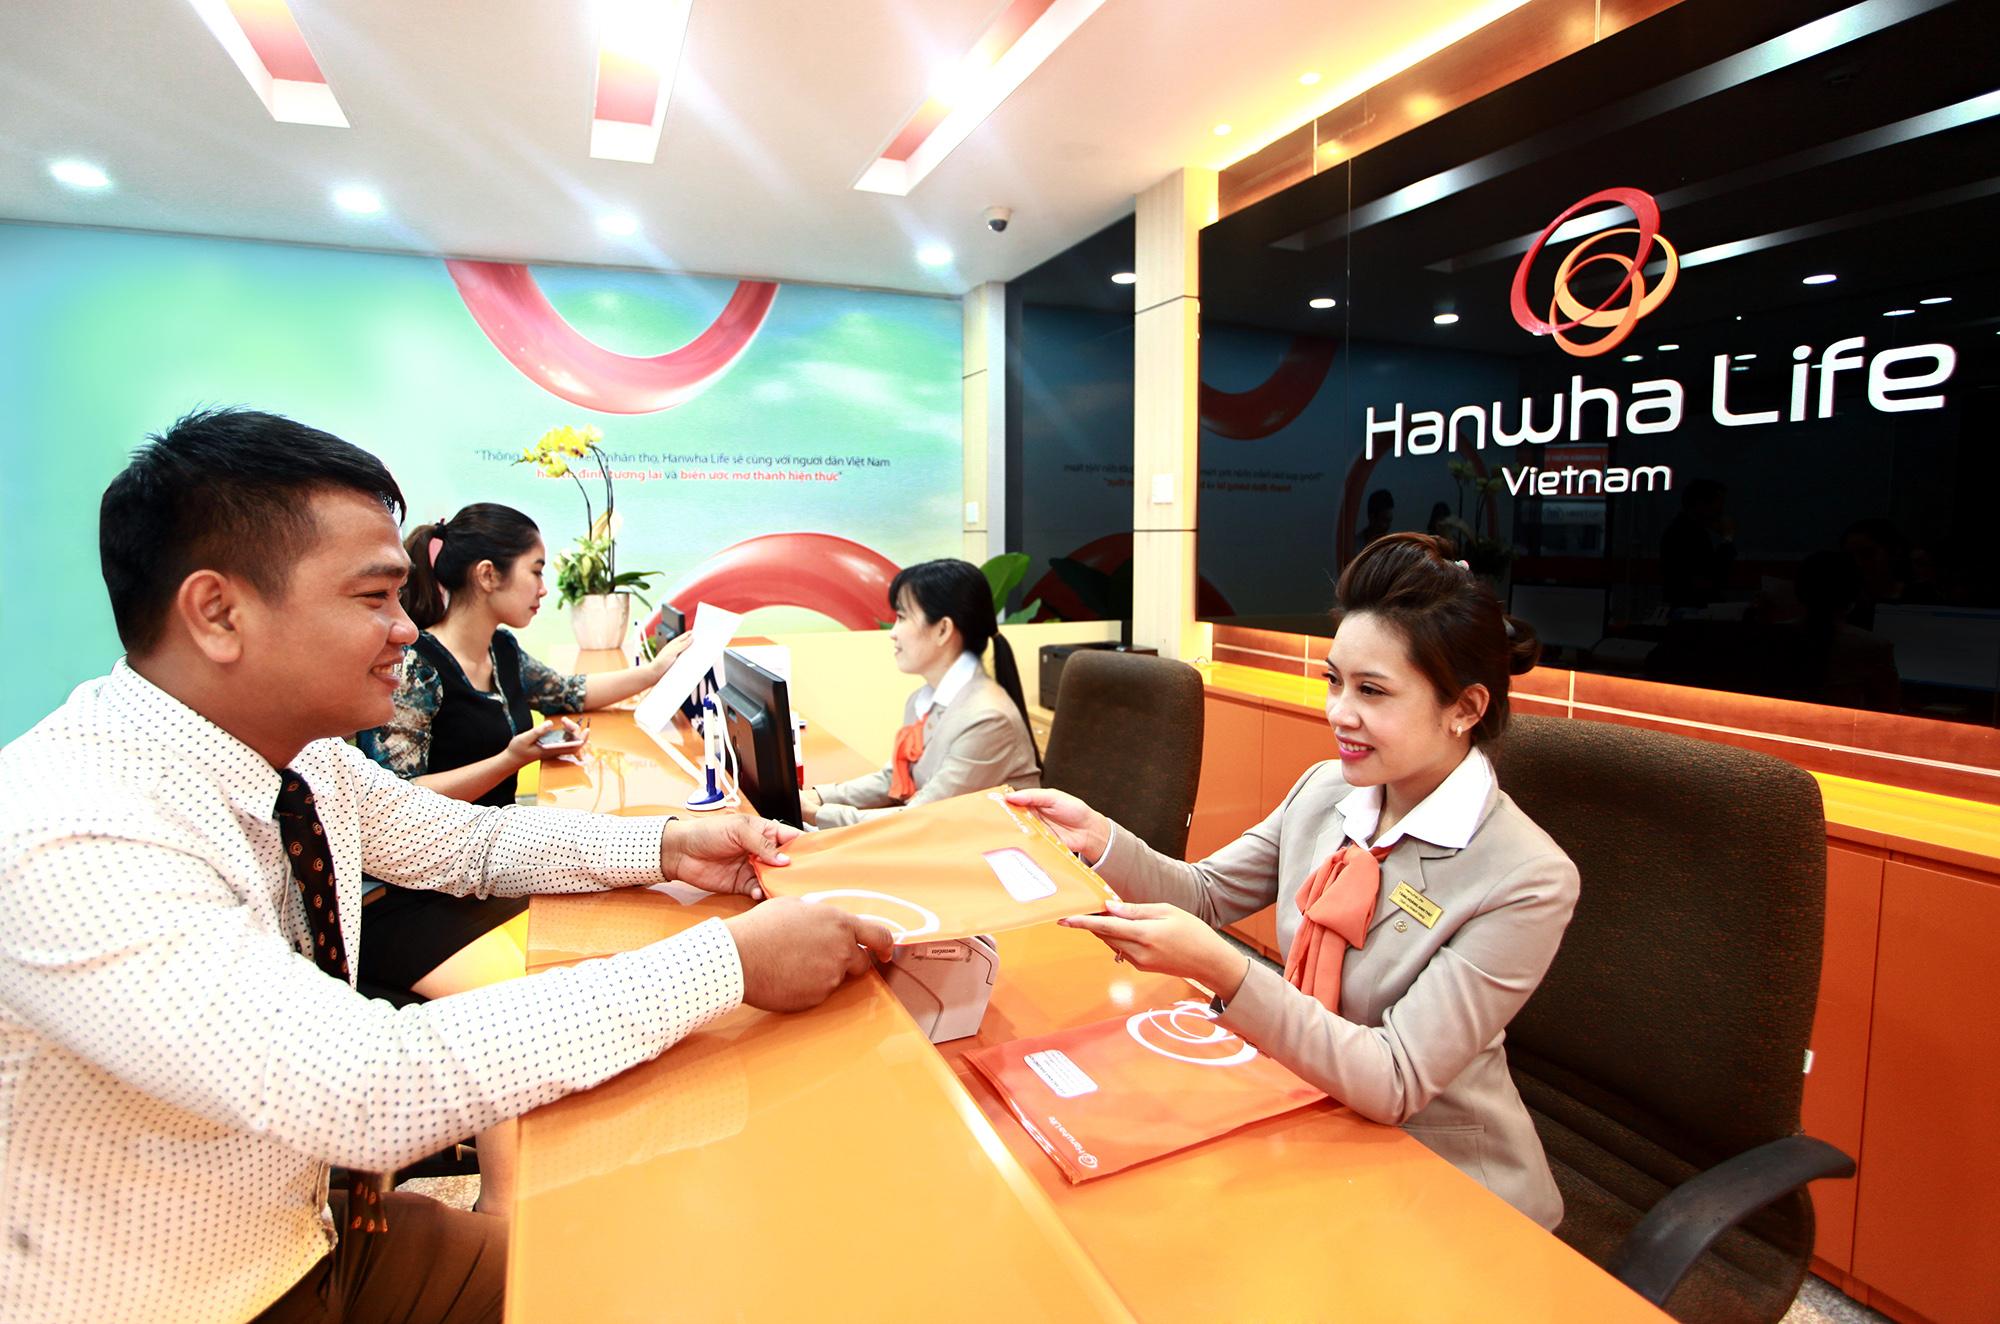 hanwha life vietnam opens 100th customer service center